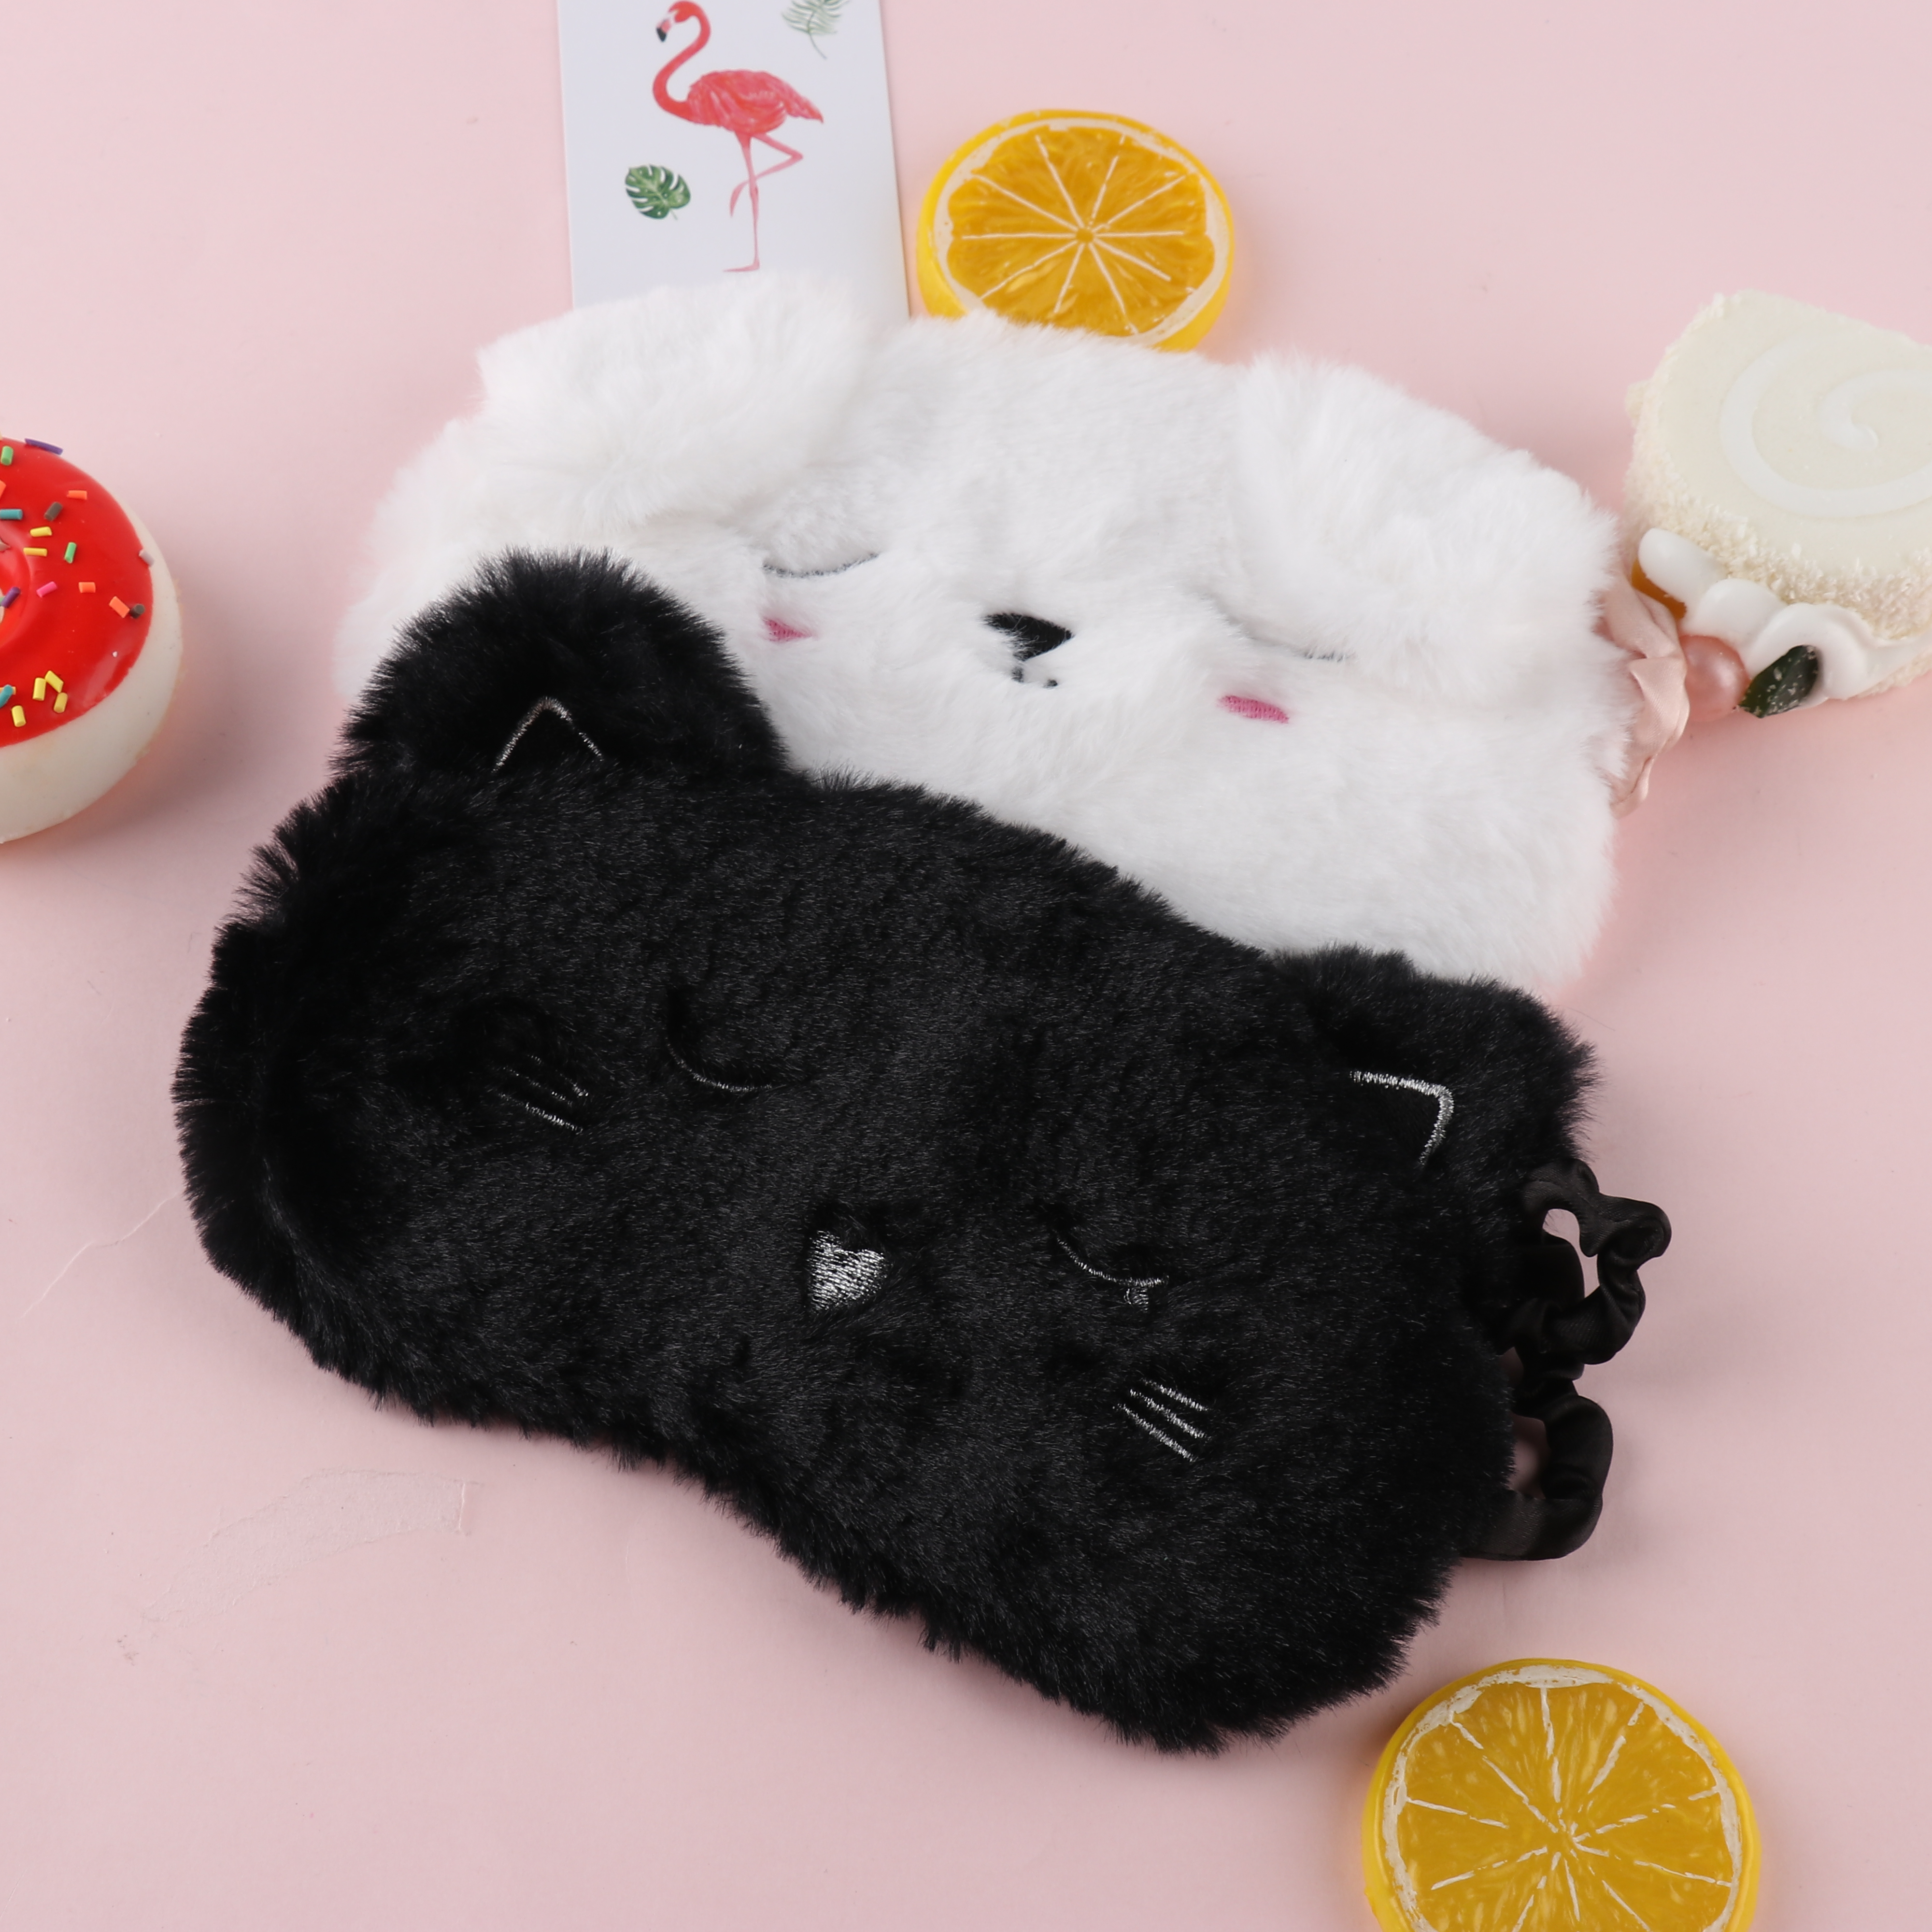 Eye Mask Sleep & Snoring Eyemask Sleep Cartoon Black White Cat Kitten Eye Mask Home Travel Goggles Shading Sleep Nap Eyeshade